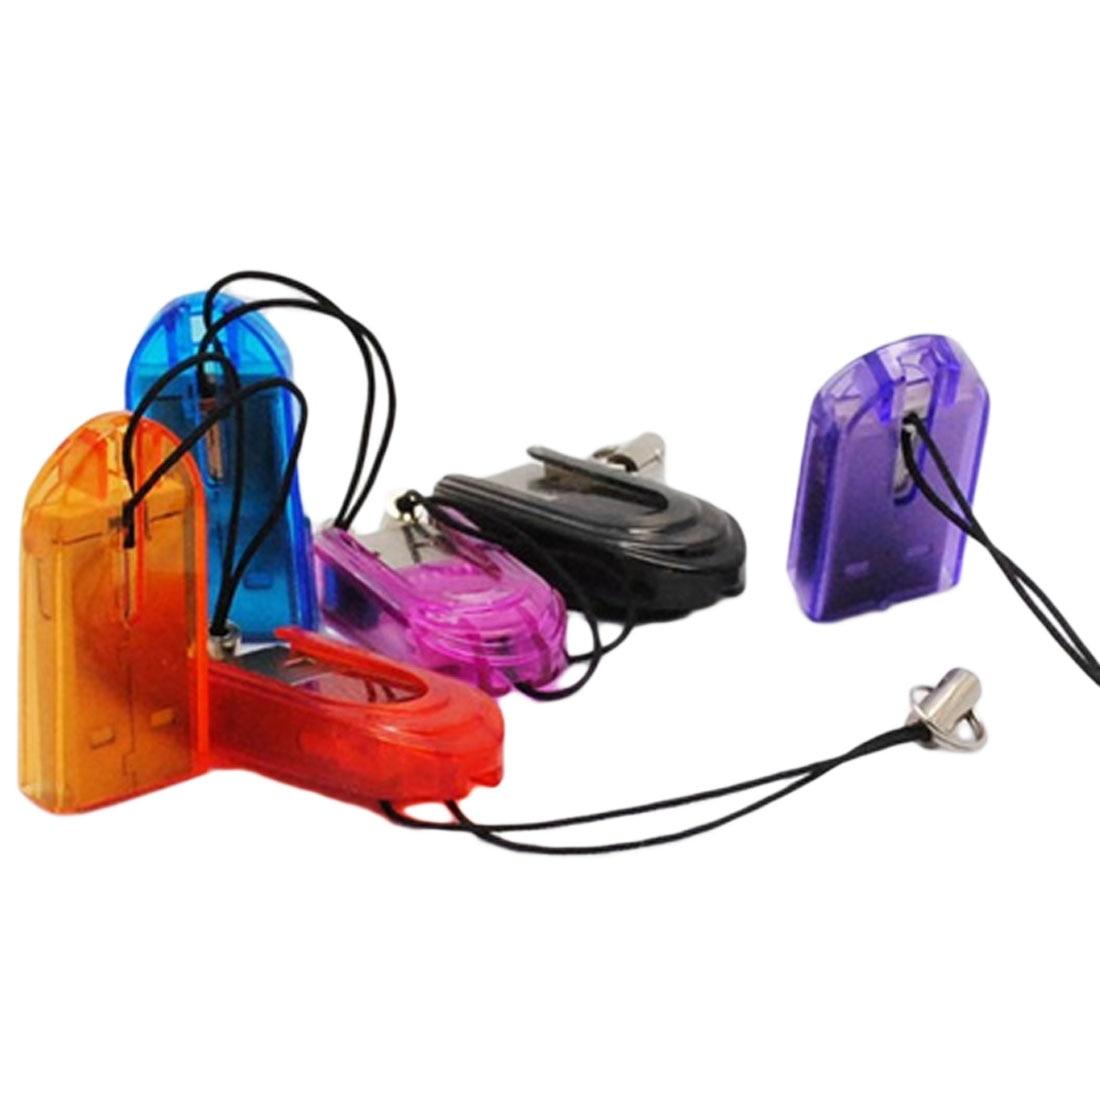 Etmakit 10pcs/lot Mini USB 2.0 Micro SD MicroSD TF Flash Memory Card Reader For IPhone Mobile Phones Multicolors